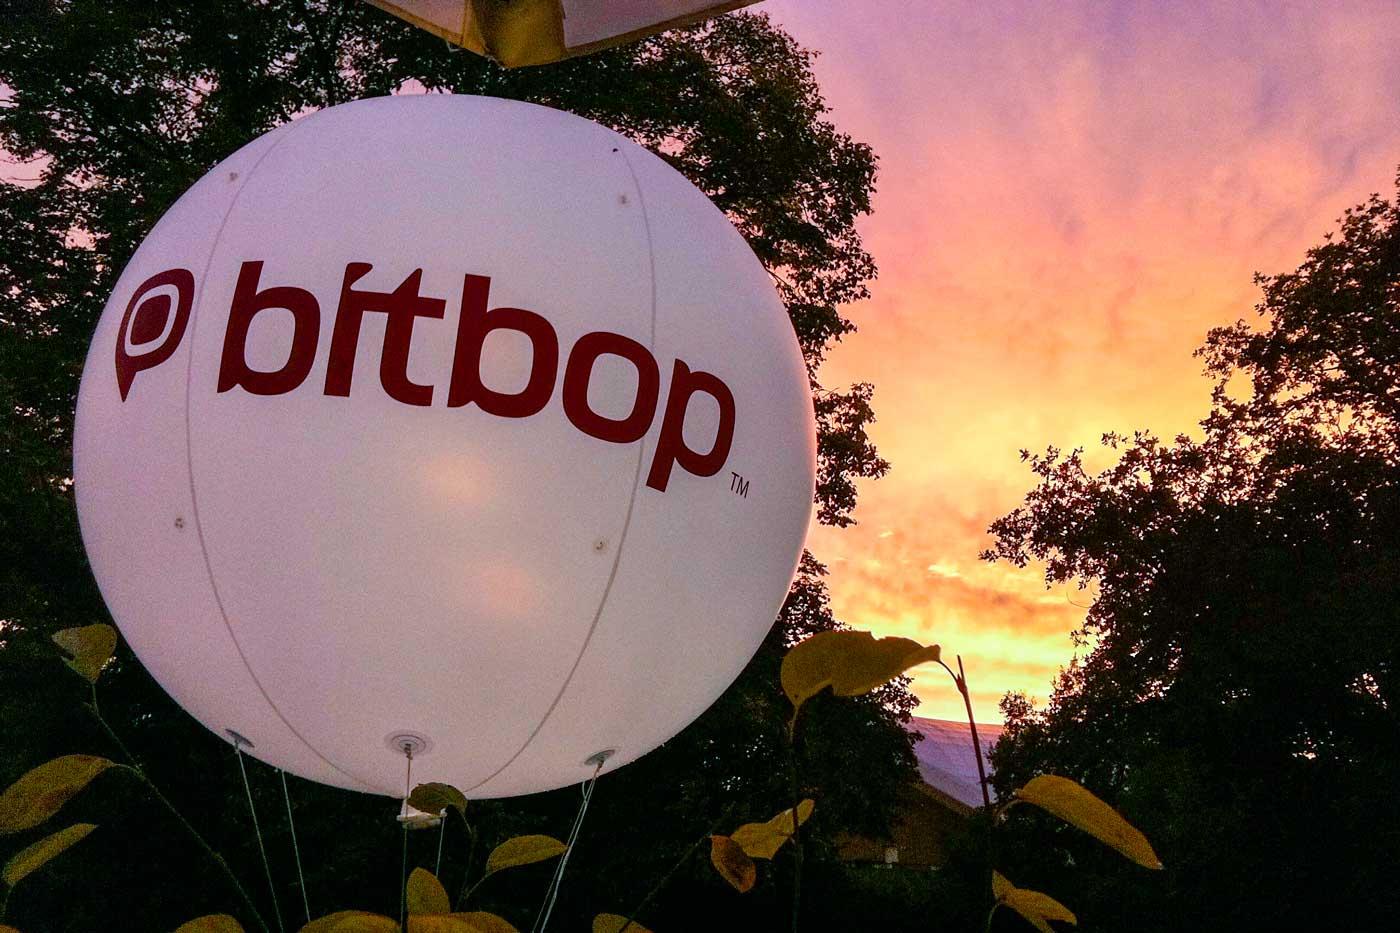 Leuchtballon 250 cm mit Logobranding vor Sonnenuntergang